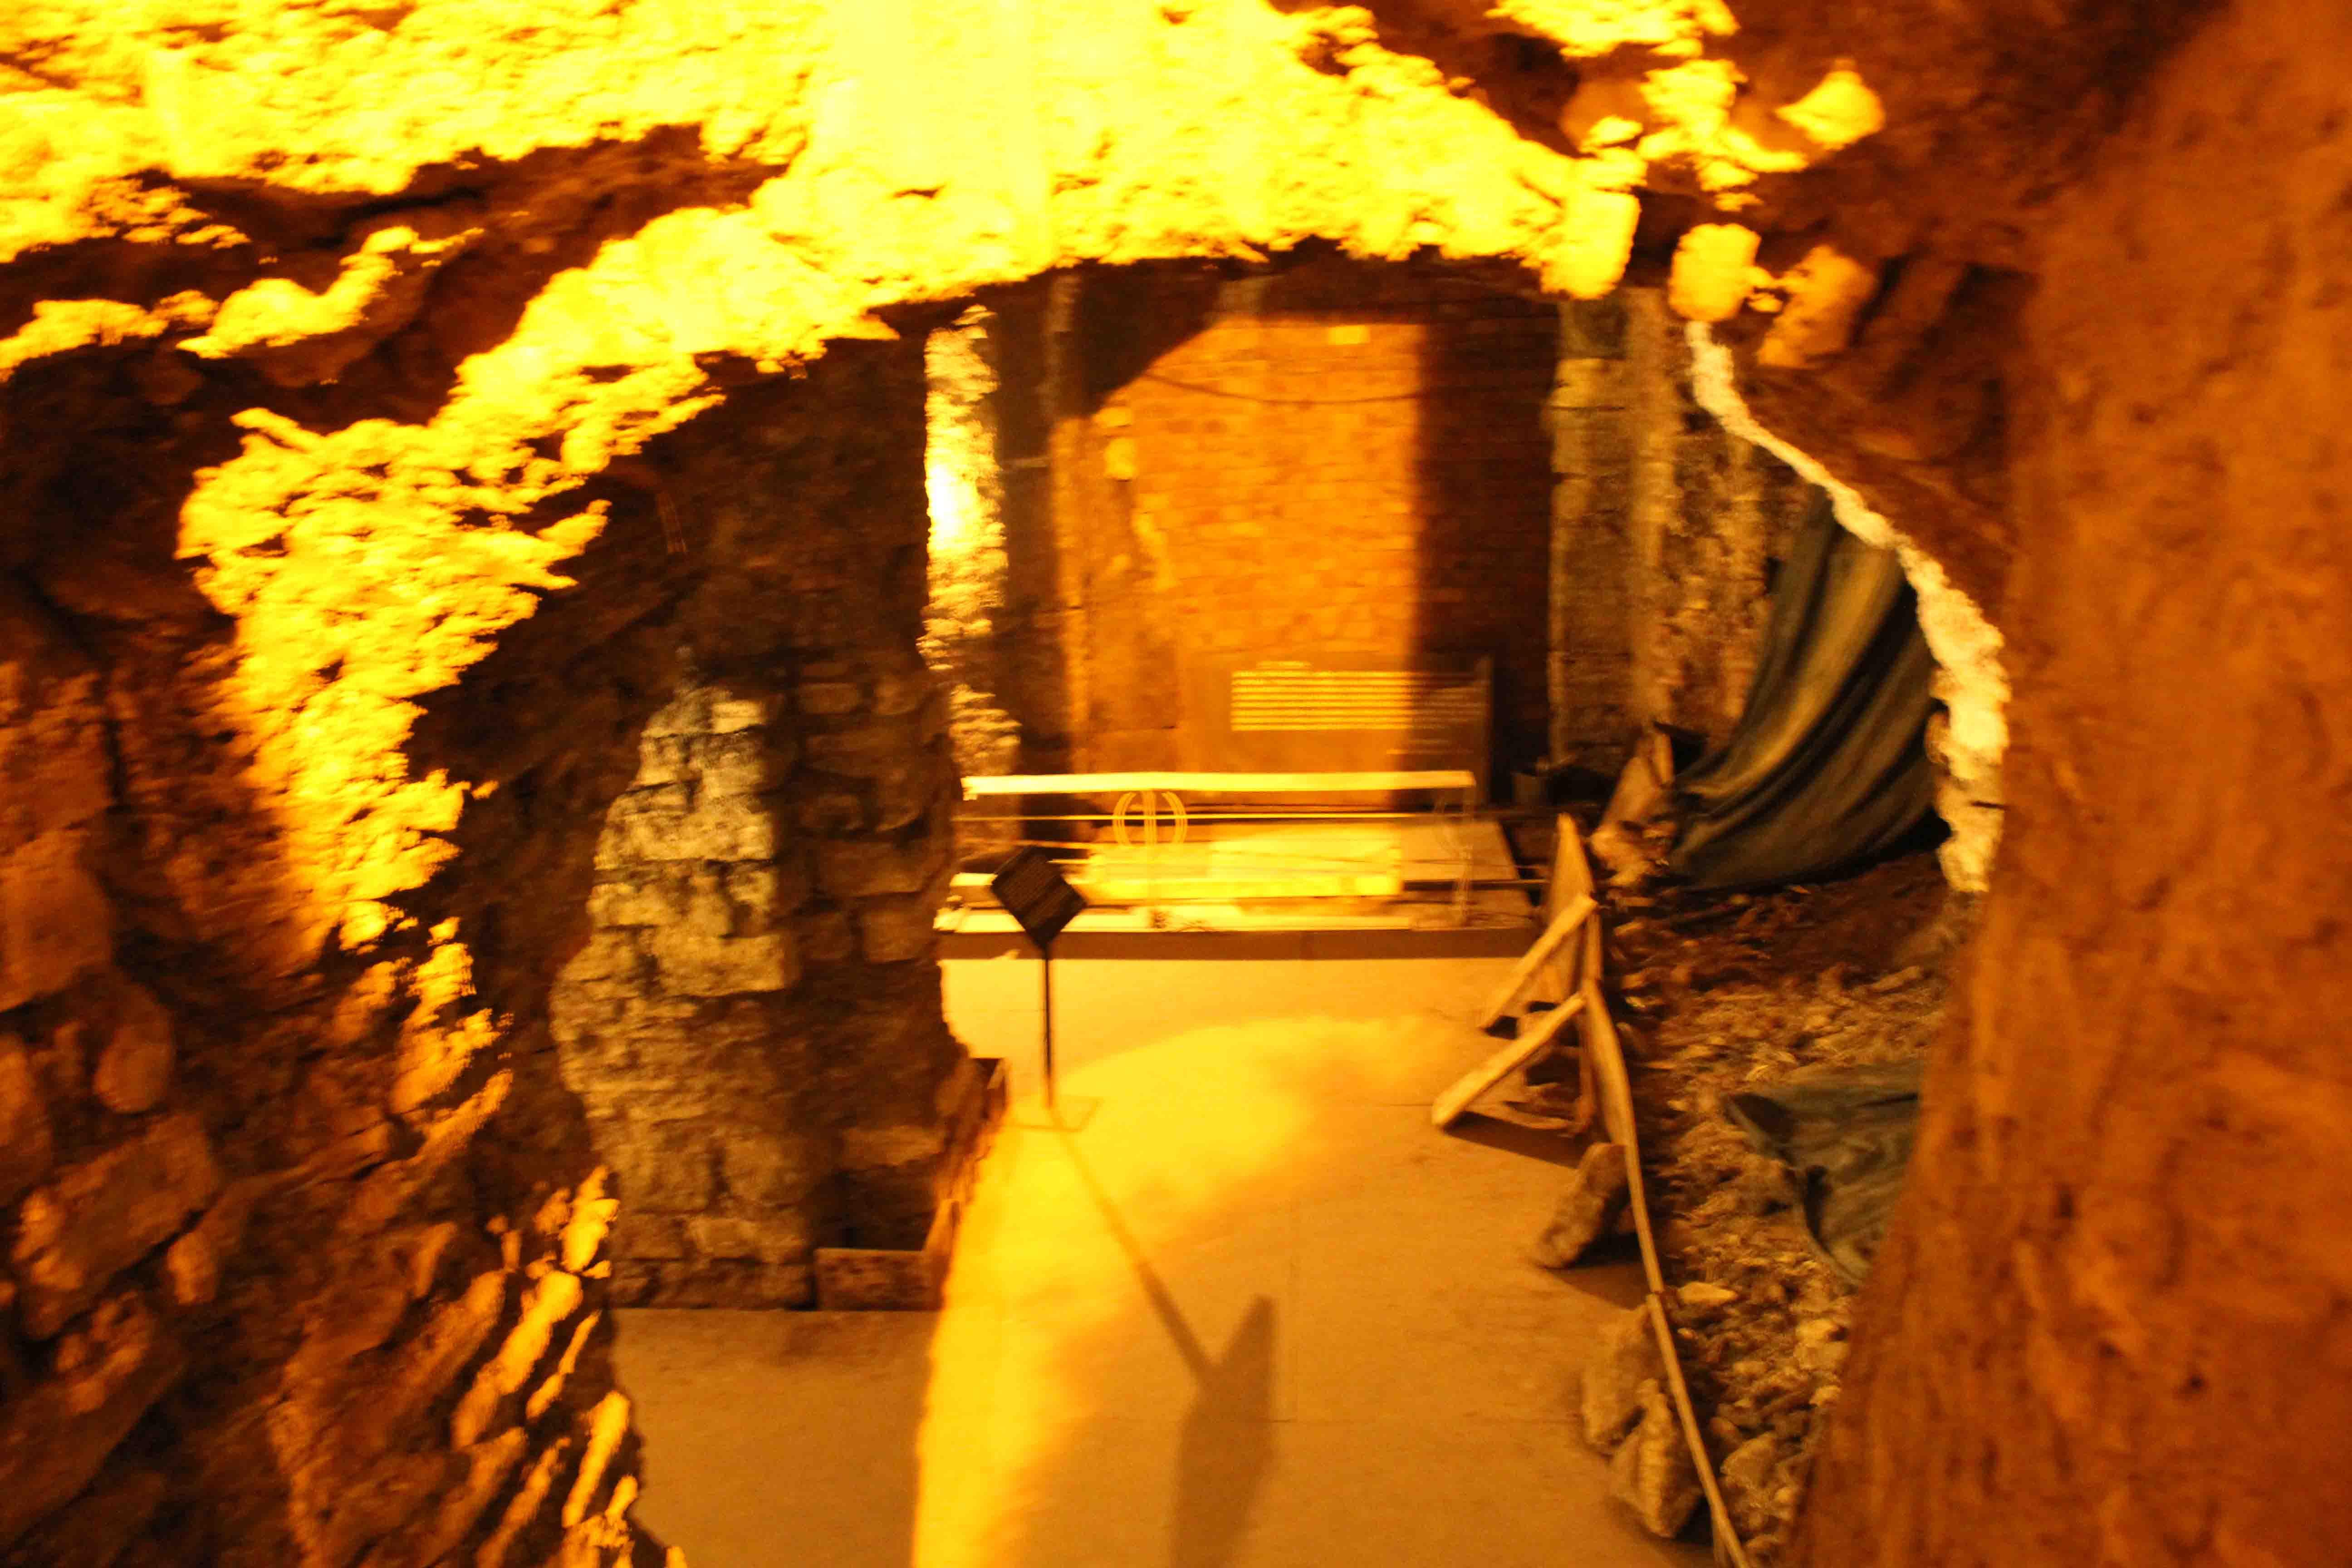 http://www.alburakathisma.com/images/galeri/orjinal/albura-Cistern-86.jpg